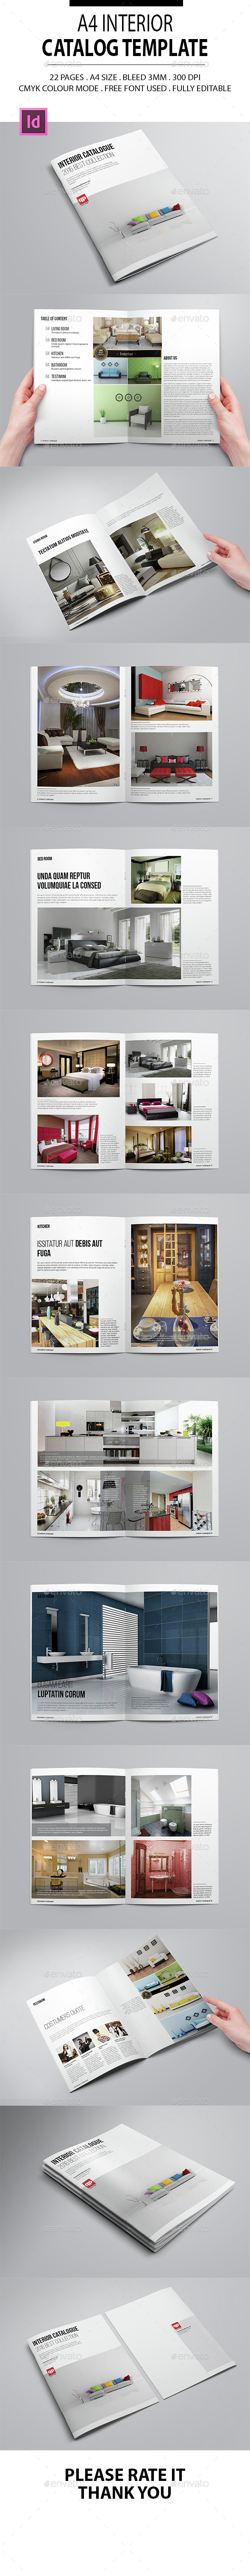 A4 Interior Catalog Template - Catalogs Brochures